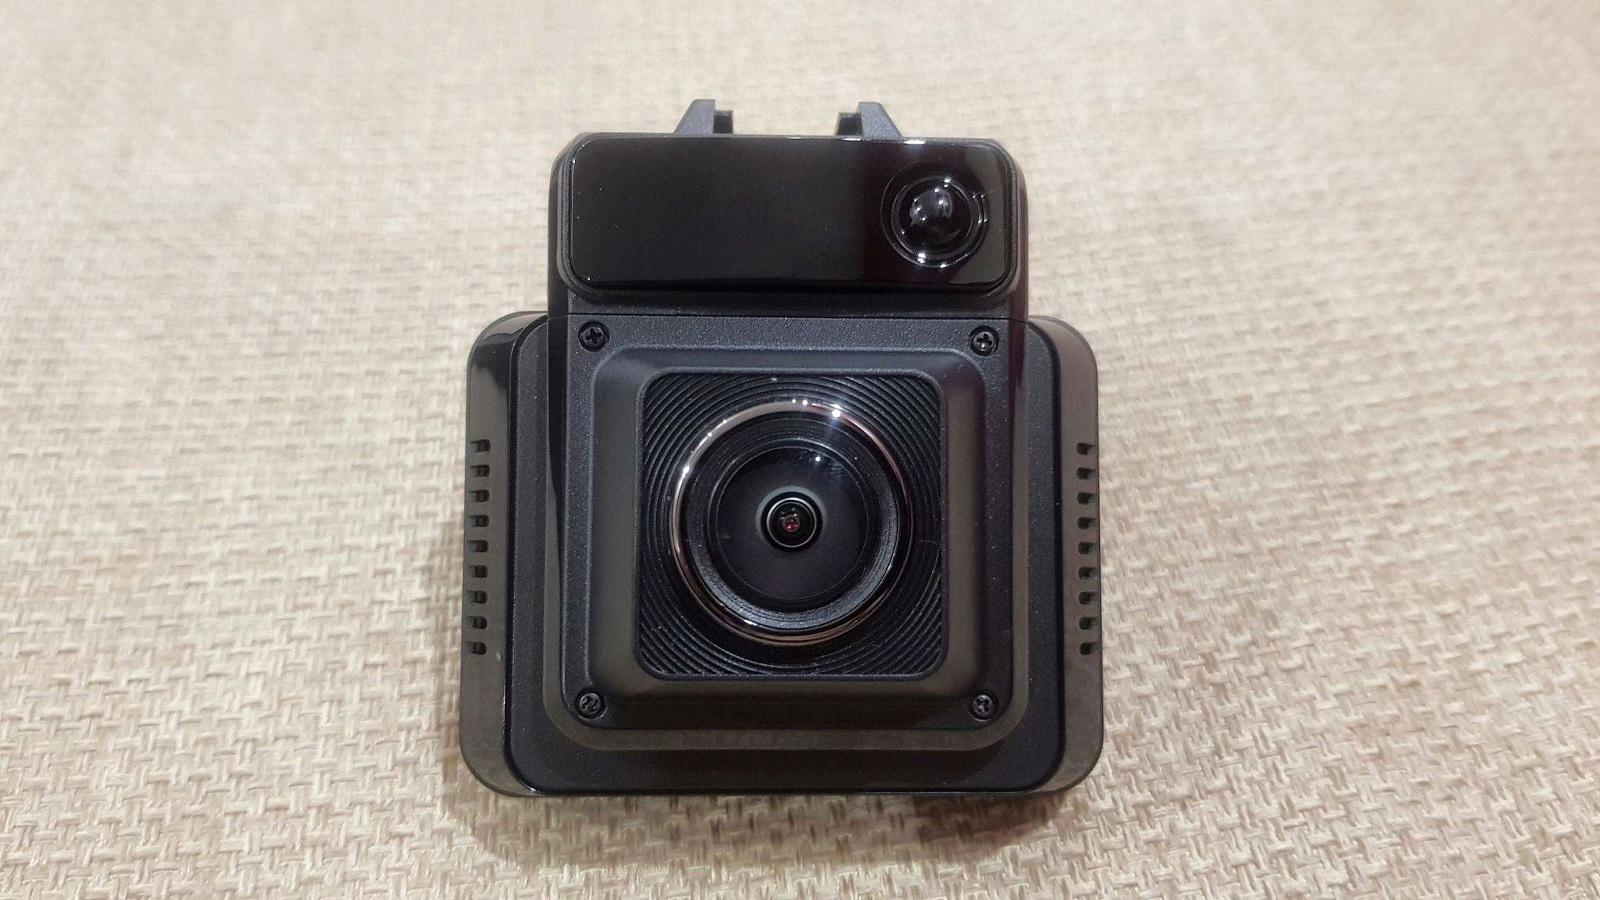 Видеорегистратор для автомобиля Slimtec Dual S2L